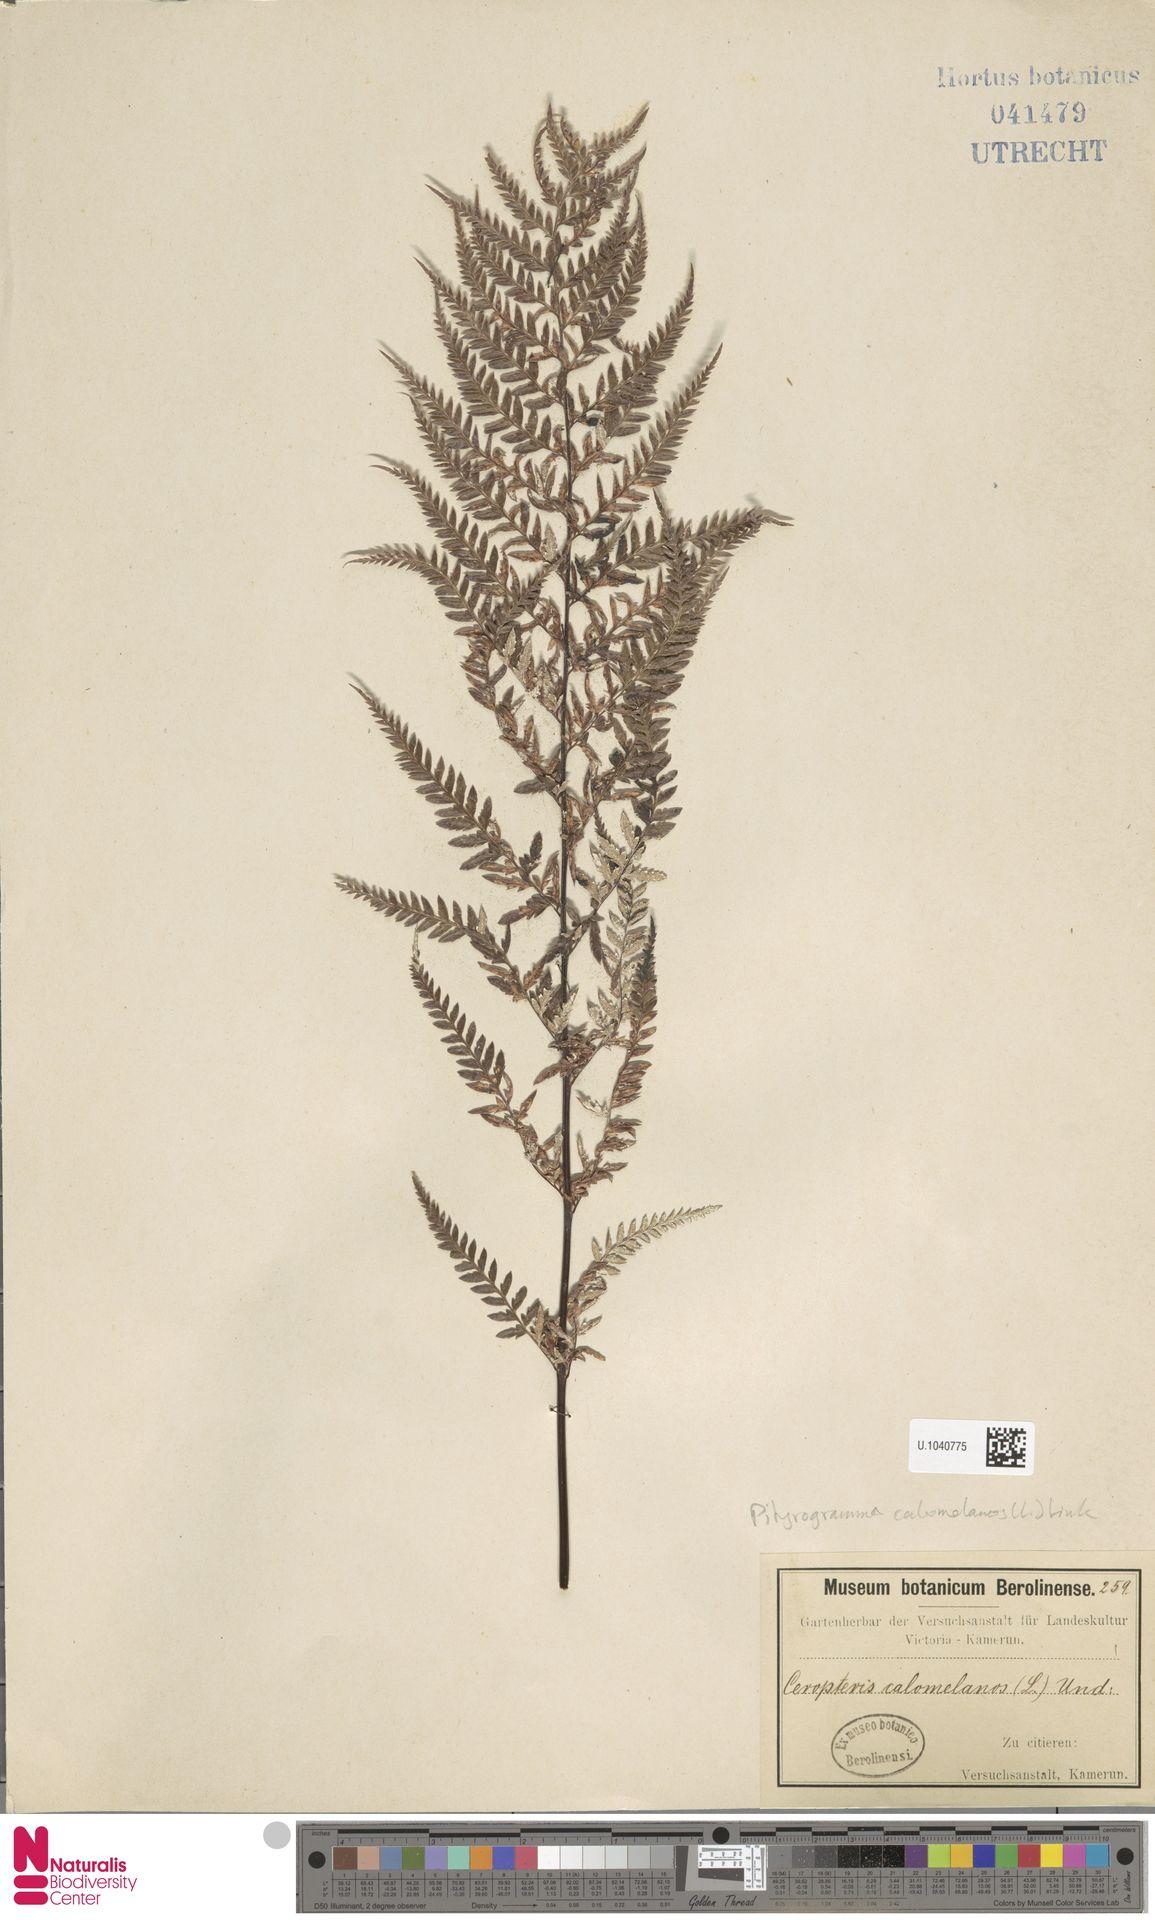 U.1040775 | Pityrogramma calomelanos (L.) Link